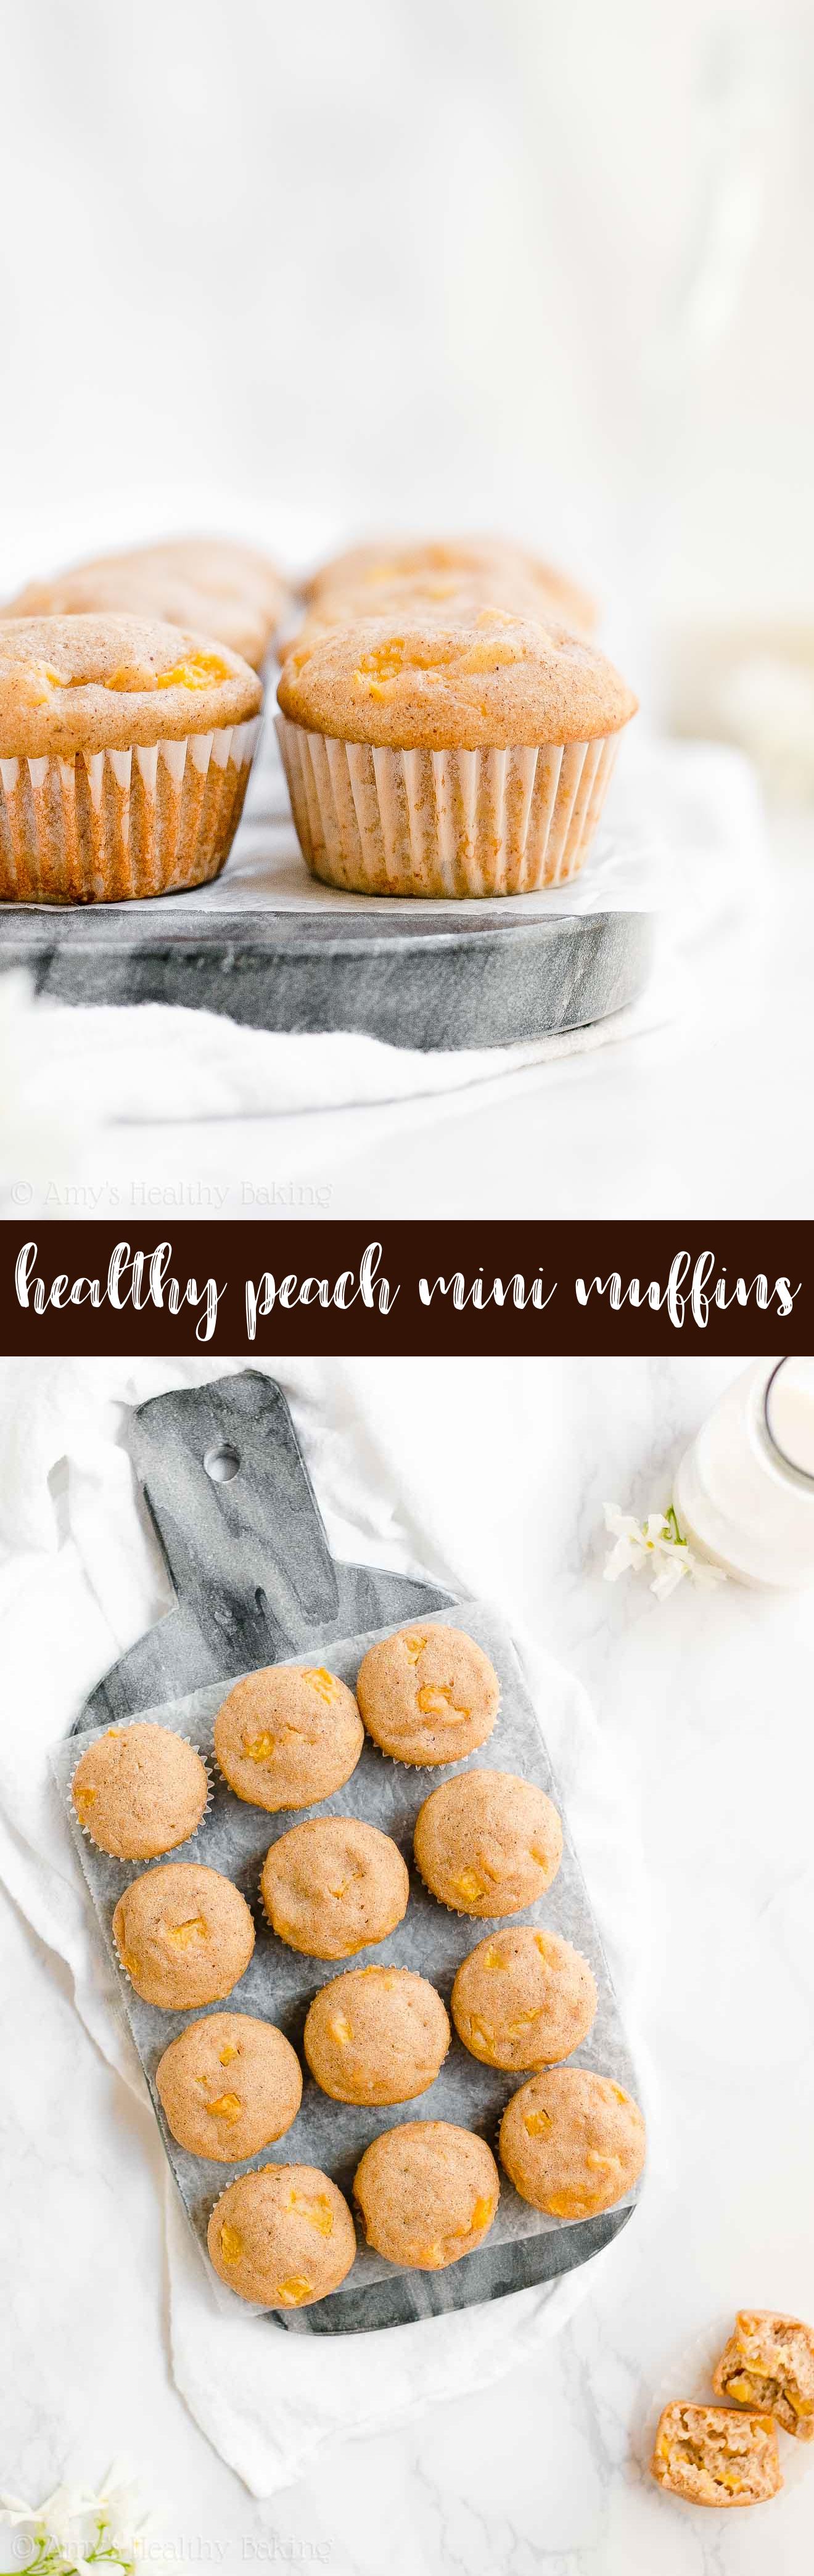 Best Ever Healthy Peach Mini Muffins